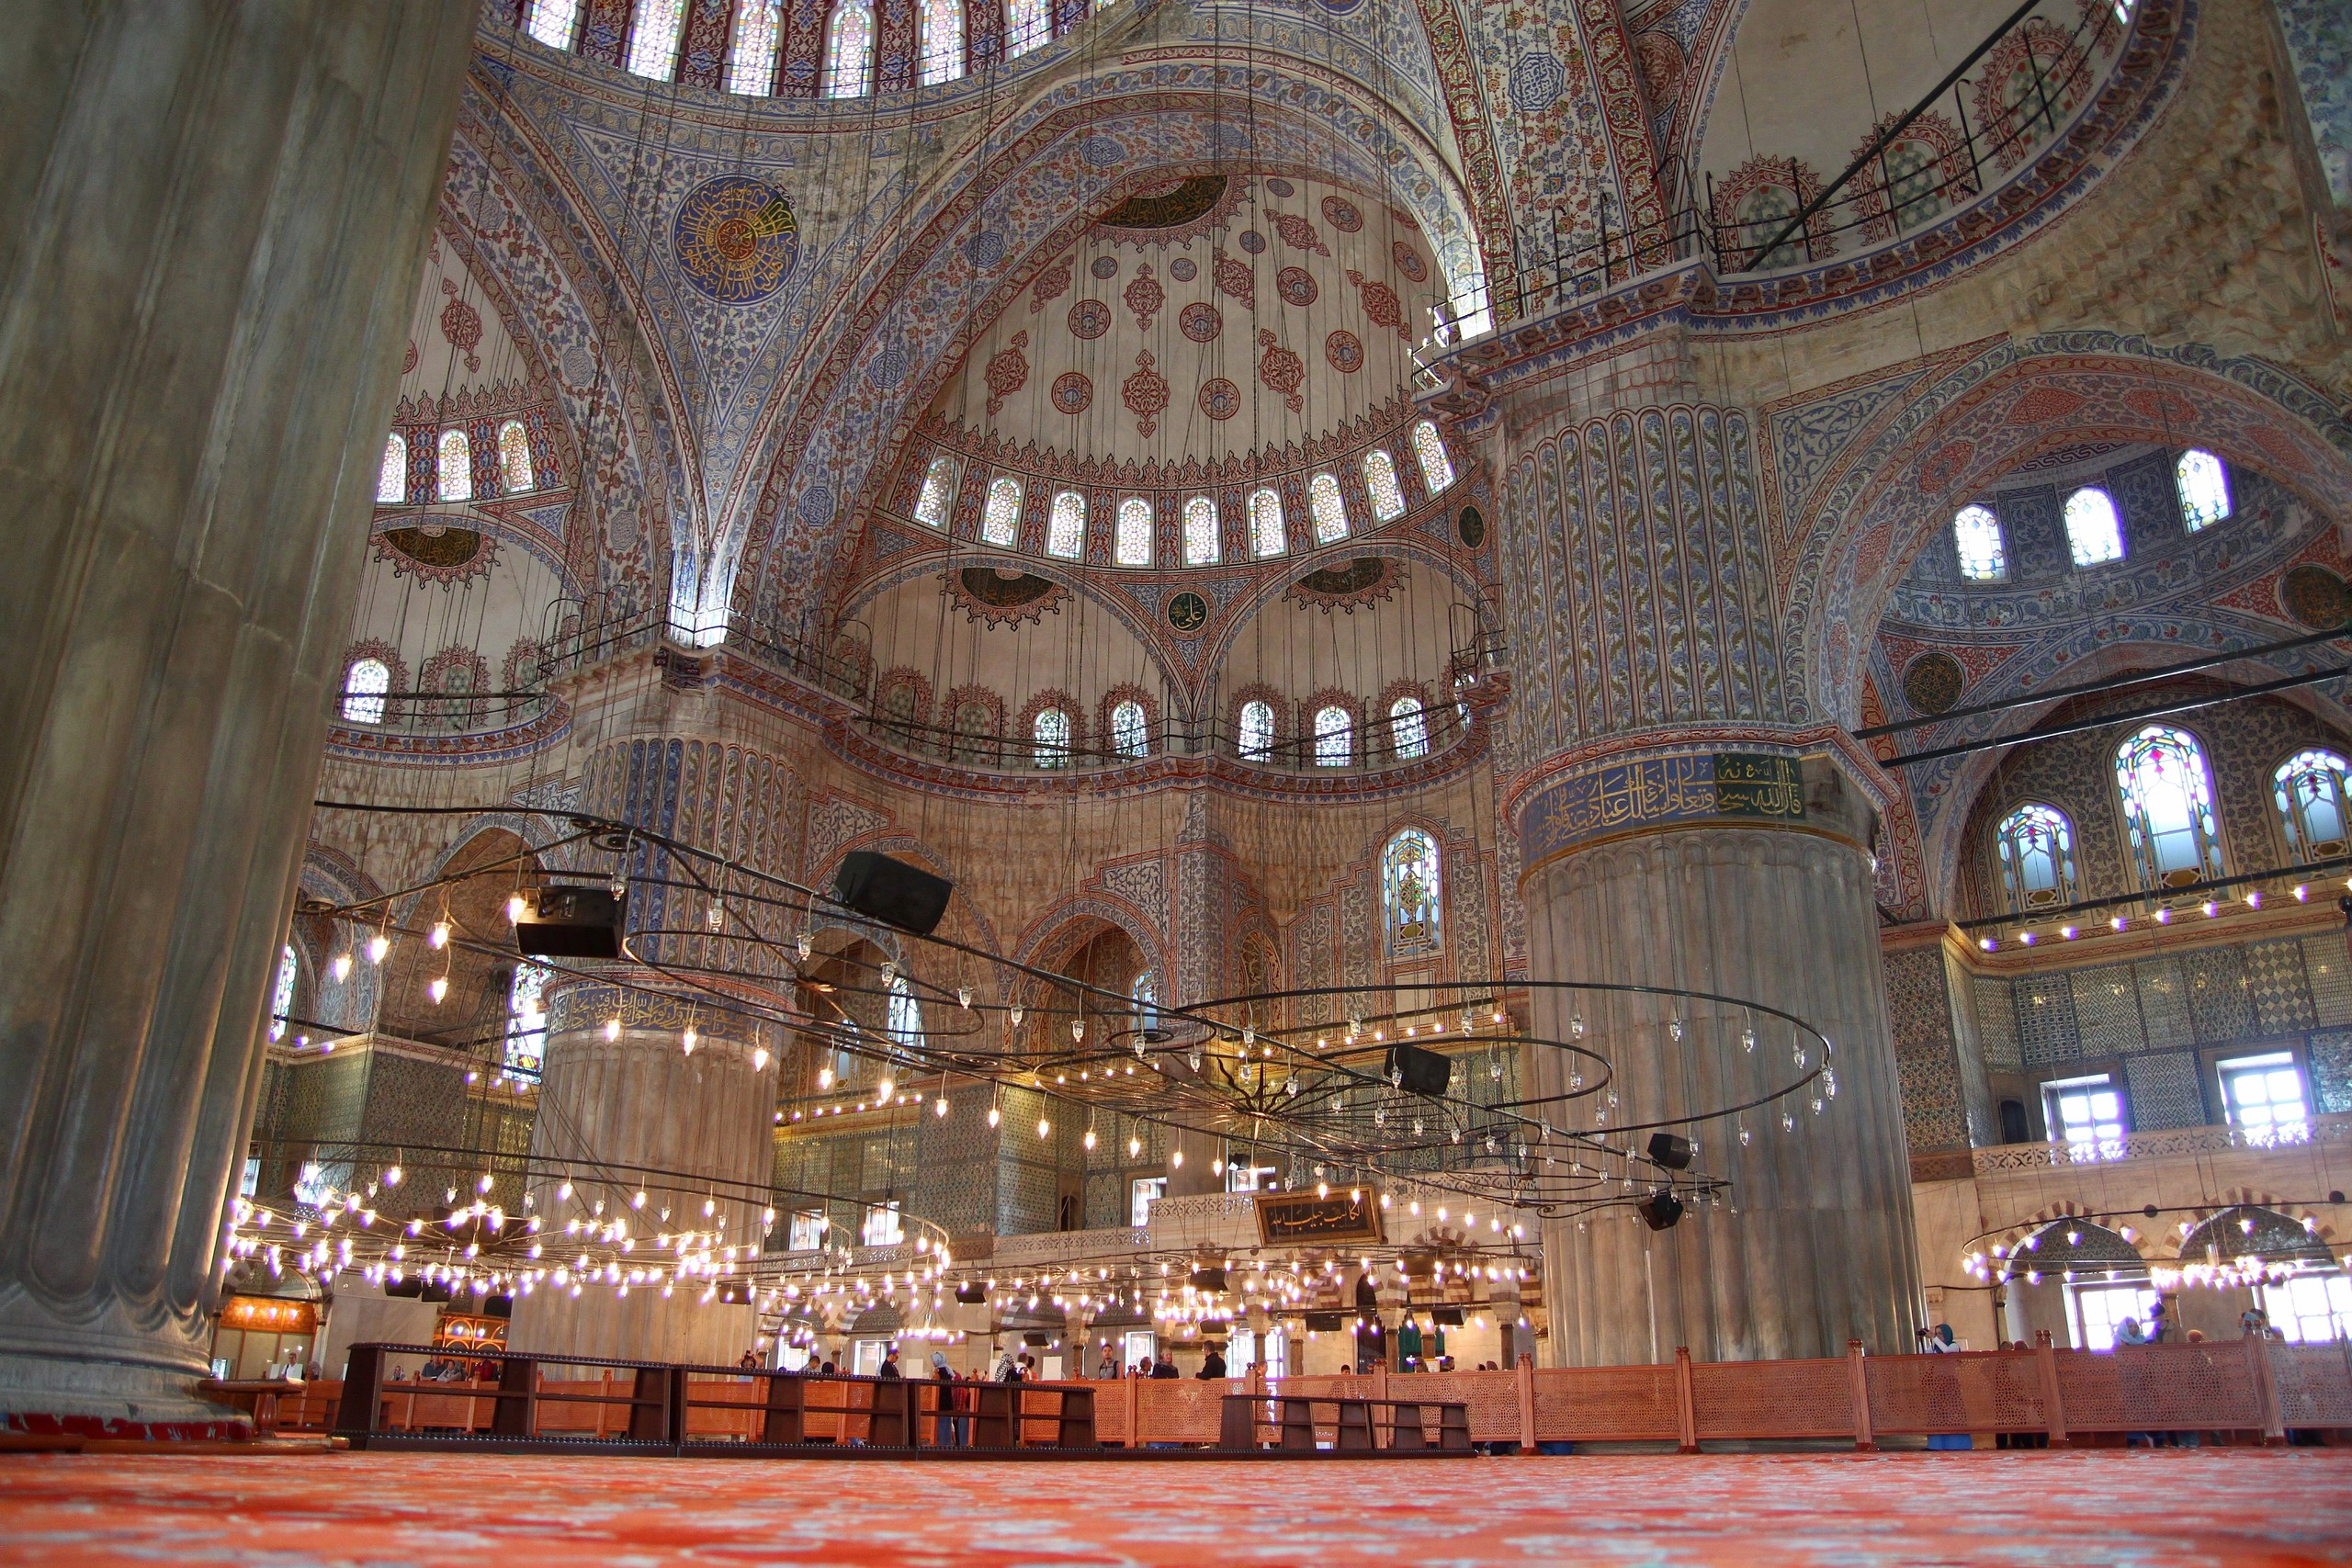 Pırlantadan Kubbeler #5: Sultanahmed - VY8j1n - Pırlantadan Kubbeler #5: Sultanahmed